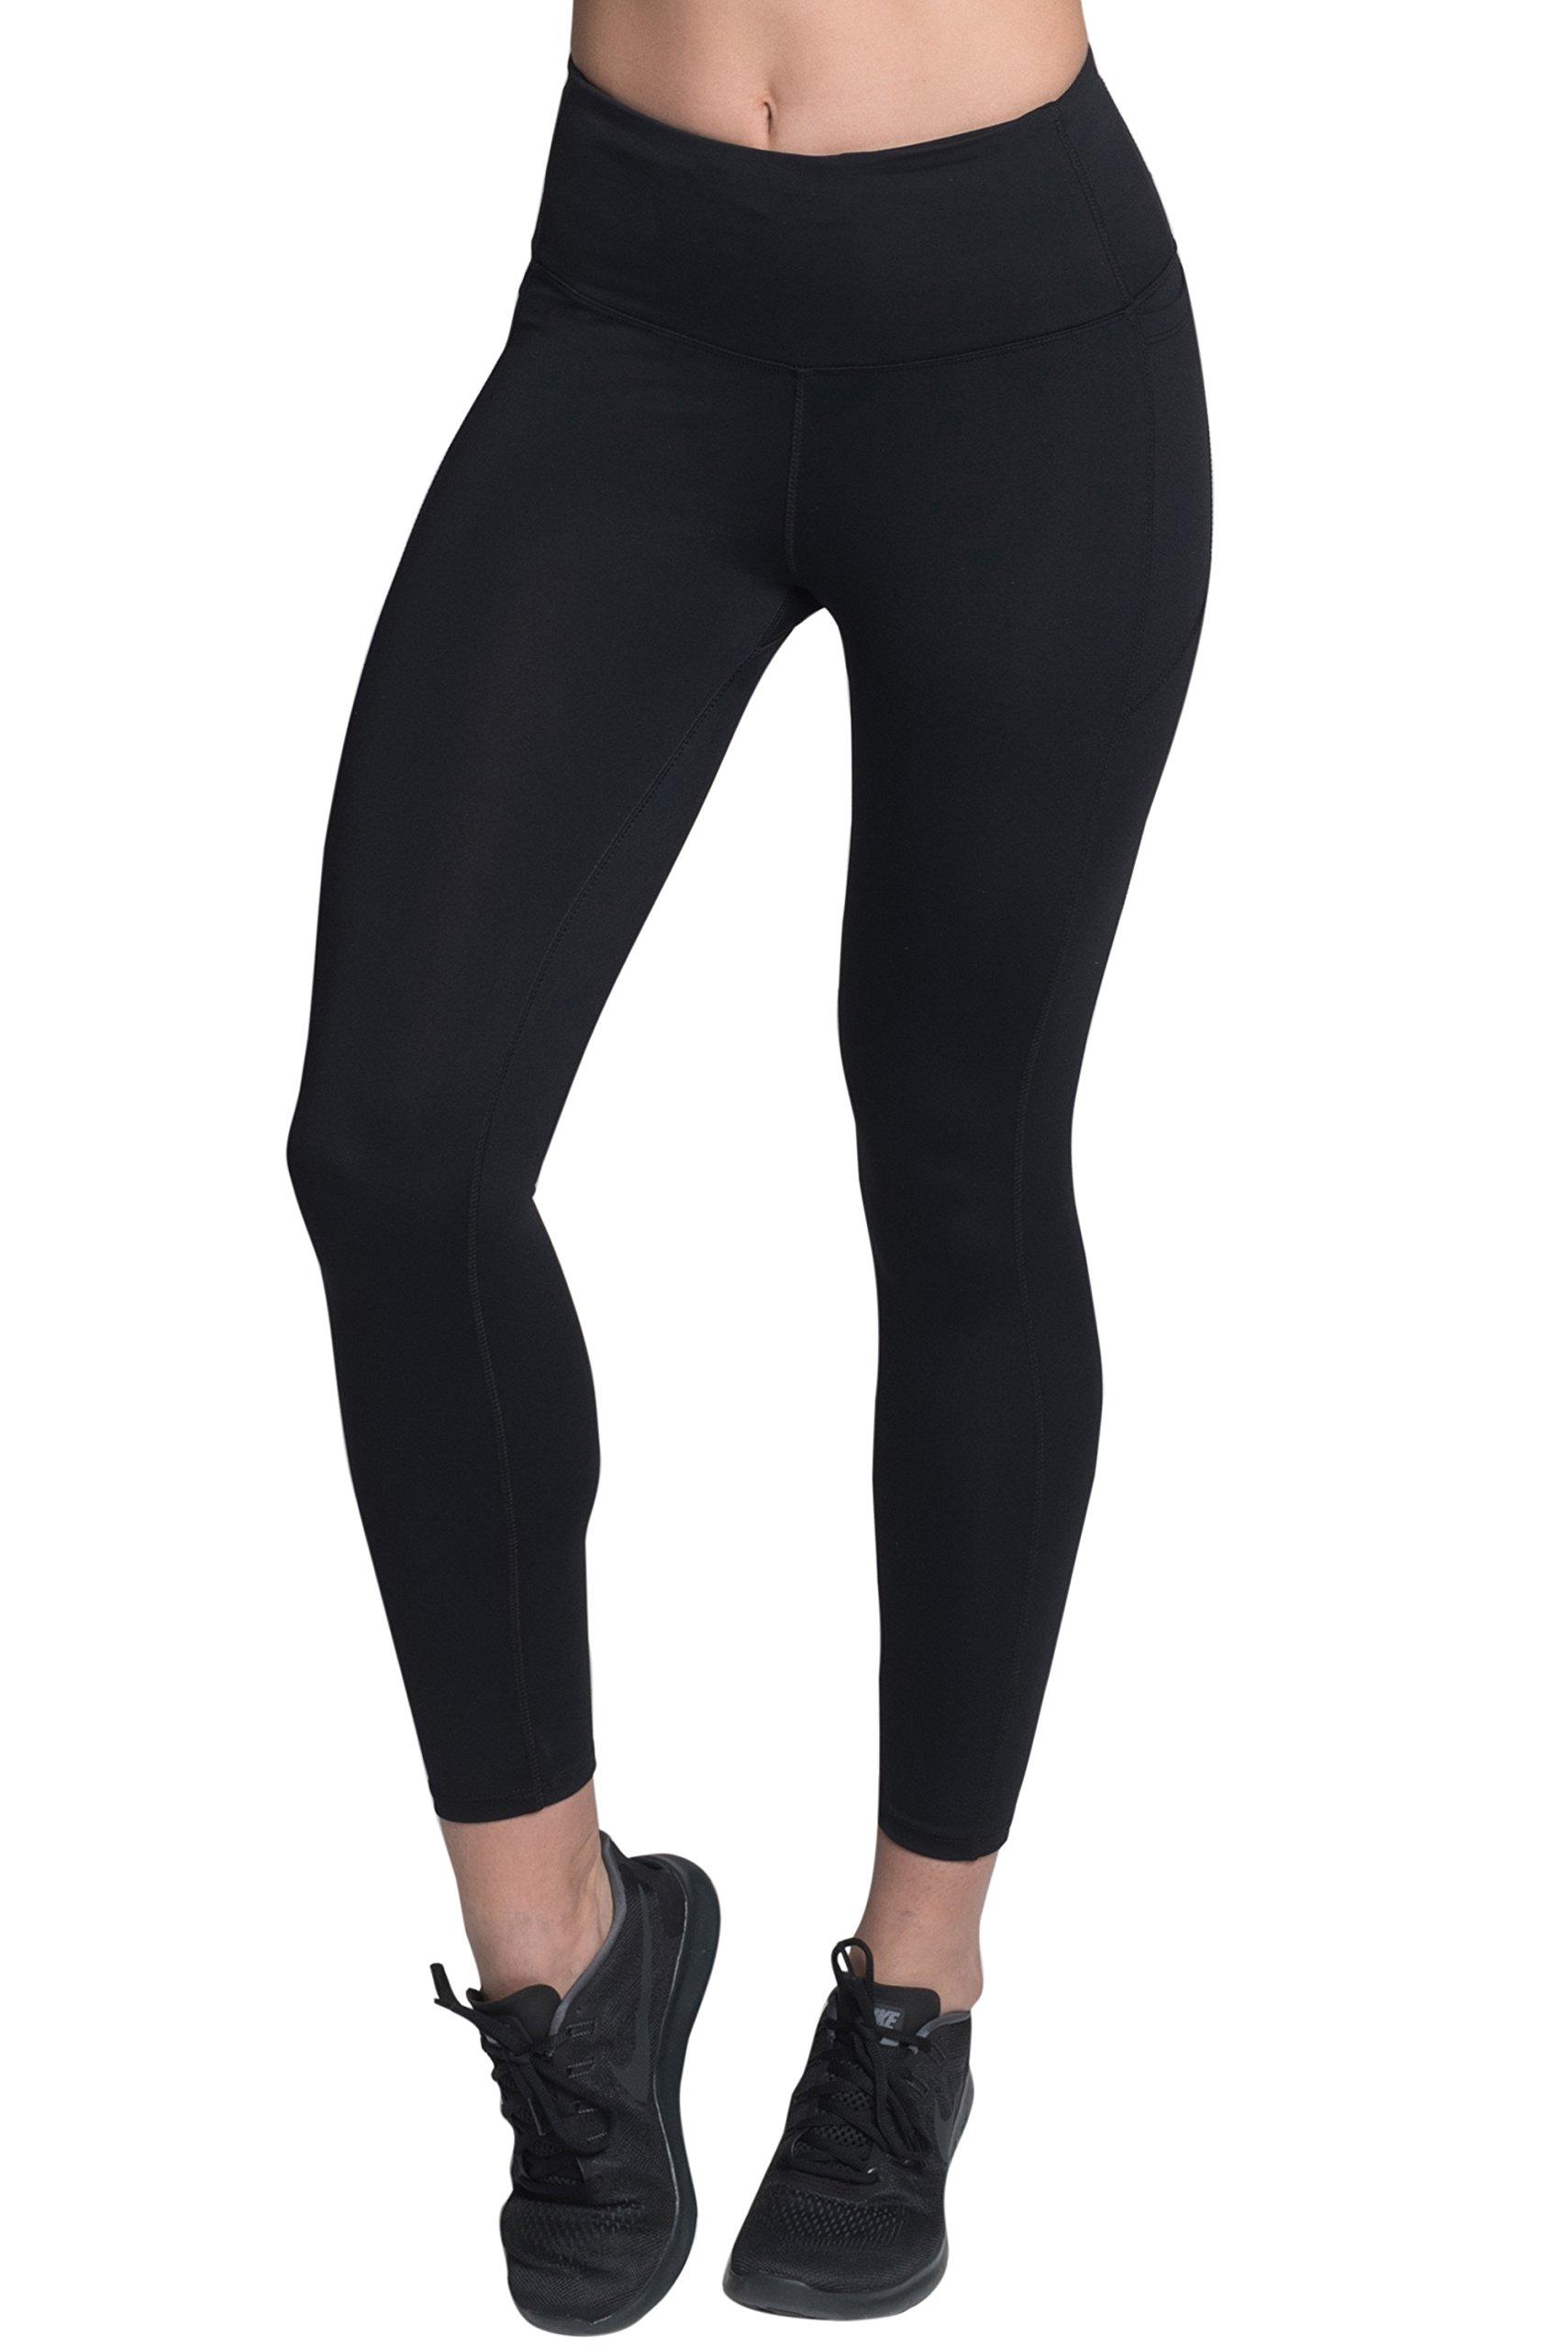 VISAKAI Black 4-Way Stretch High Rise Freedom 7/8 Leggings with Dual Pocket, 23-inch, Small